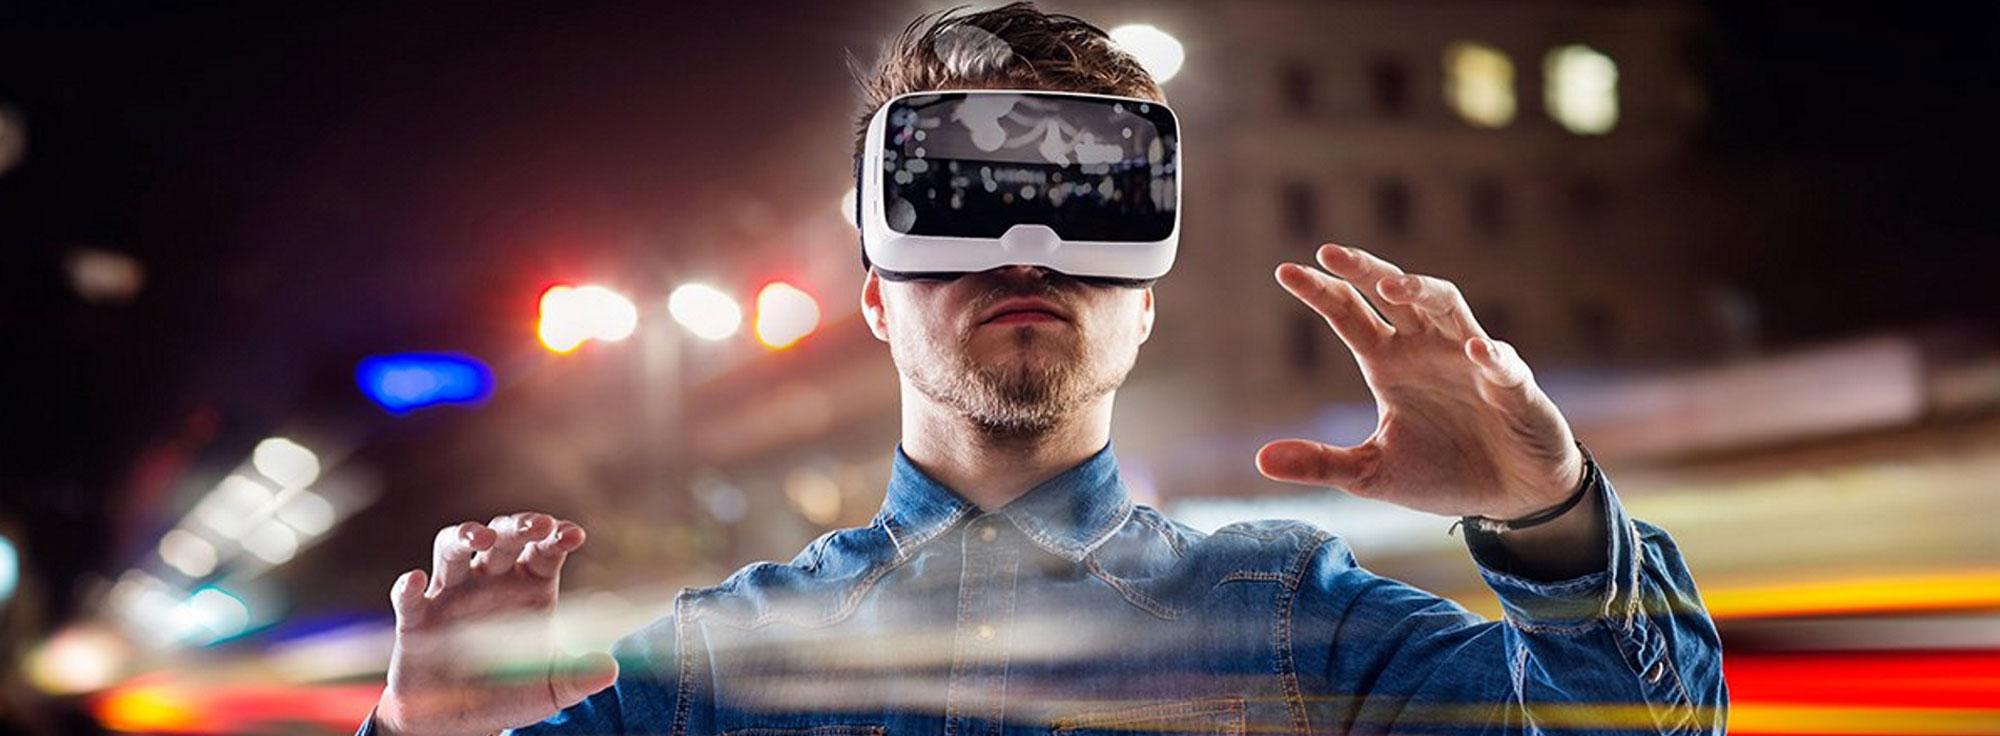 Realtà Virtuale e visori VR Torino